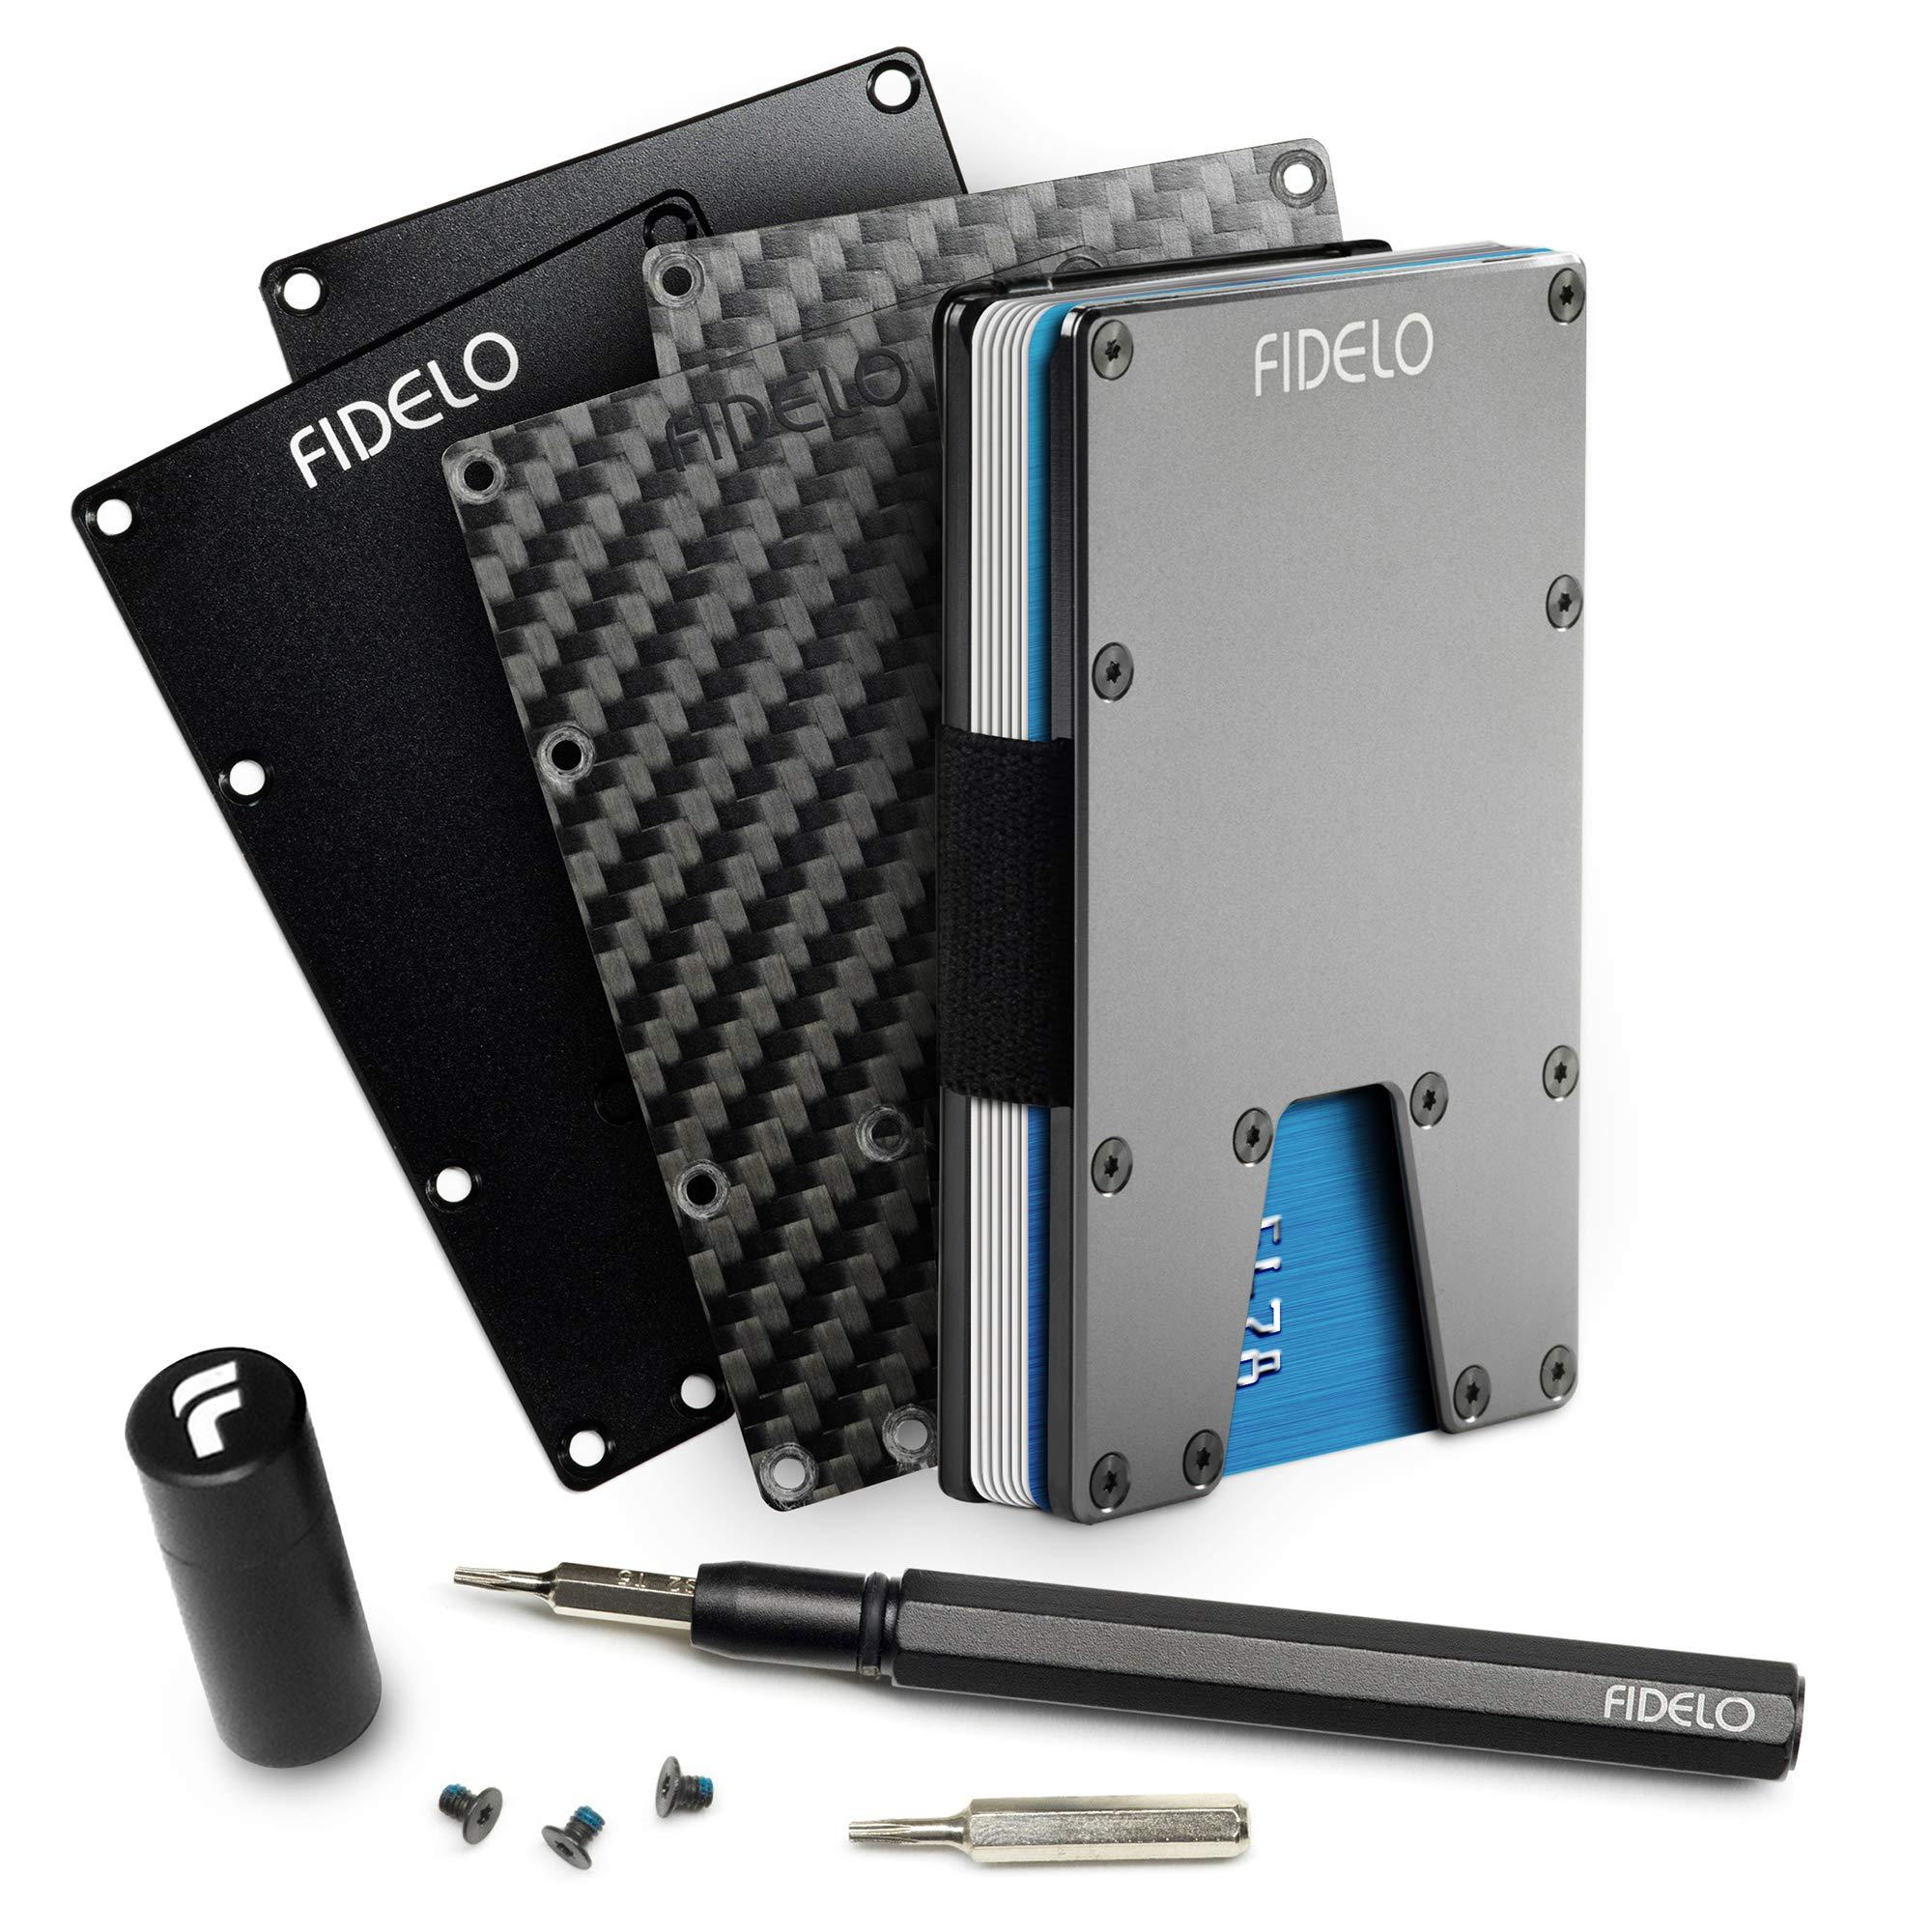 FIDELO Minimalist Wallet For Men - Slim RFID Credit Card Holder Money Clip by FIDELO